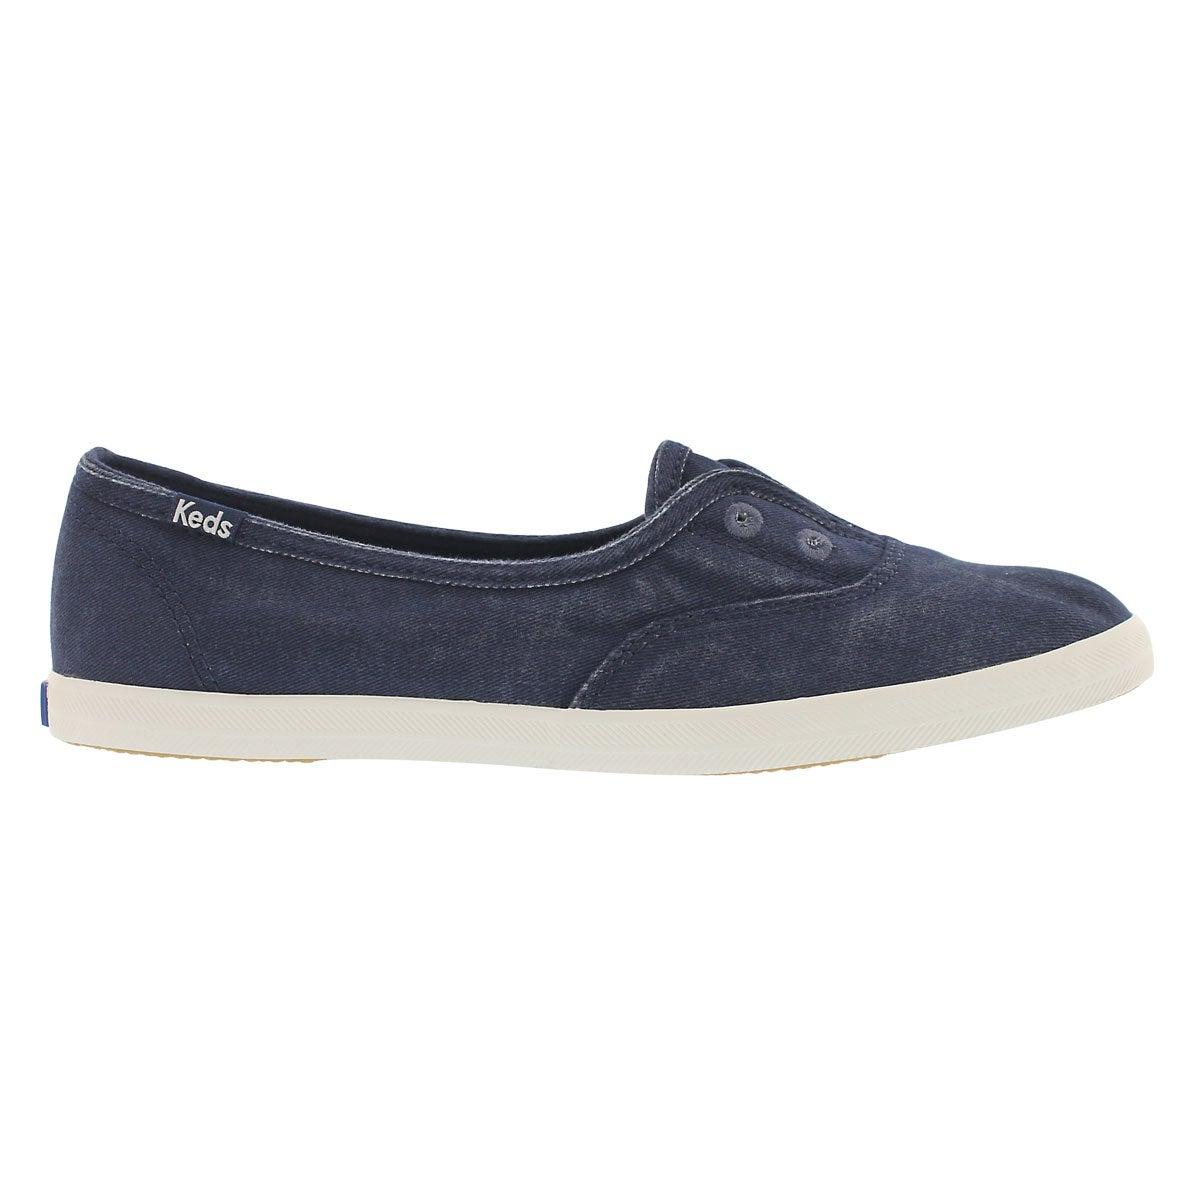 Lds Chillax Mini navy fashion sneaker